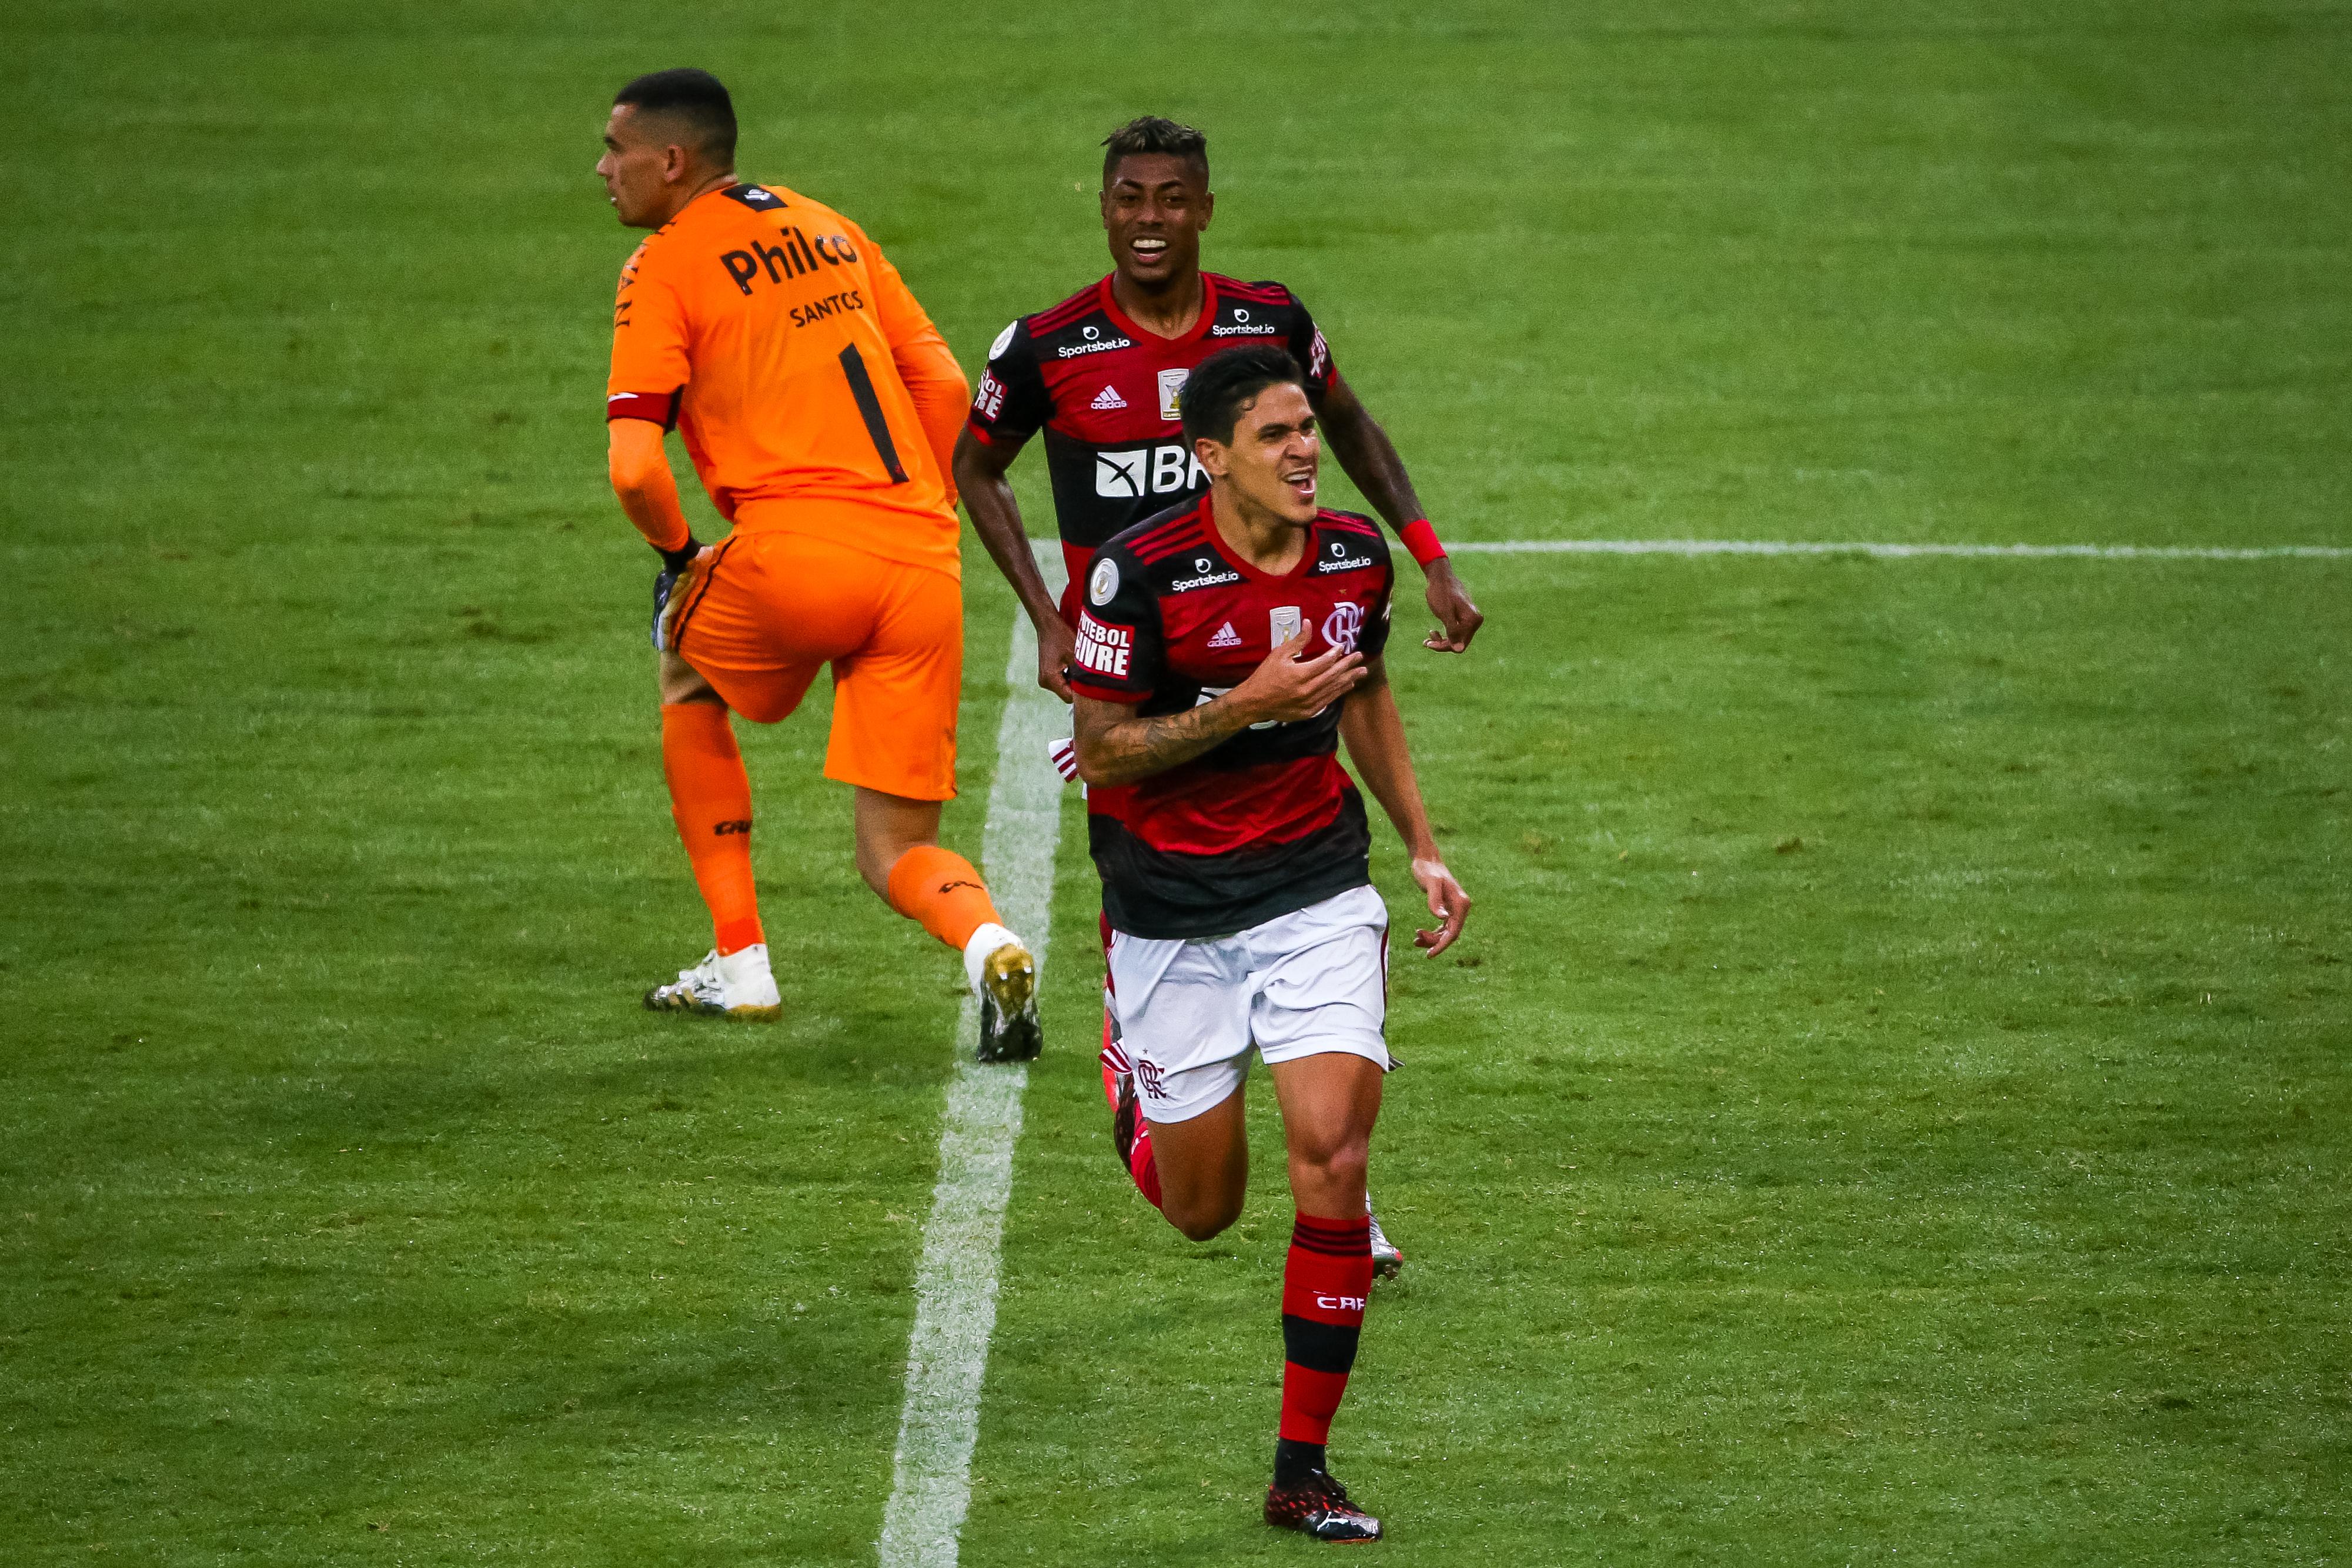 2020 Brasileirao Series A: Flamengo v Athletico PR Play Behind Closed Doors Amidst the Coronavirus (COVID - 19) Pandemic